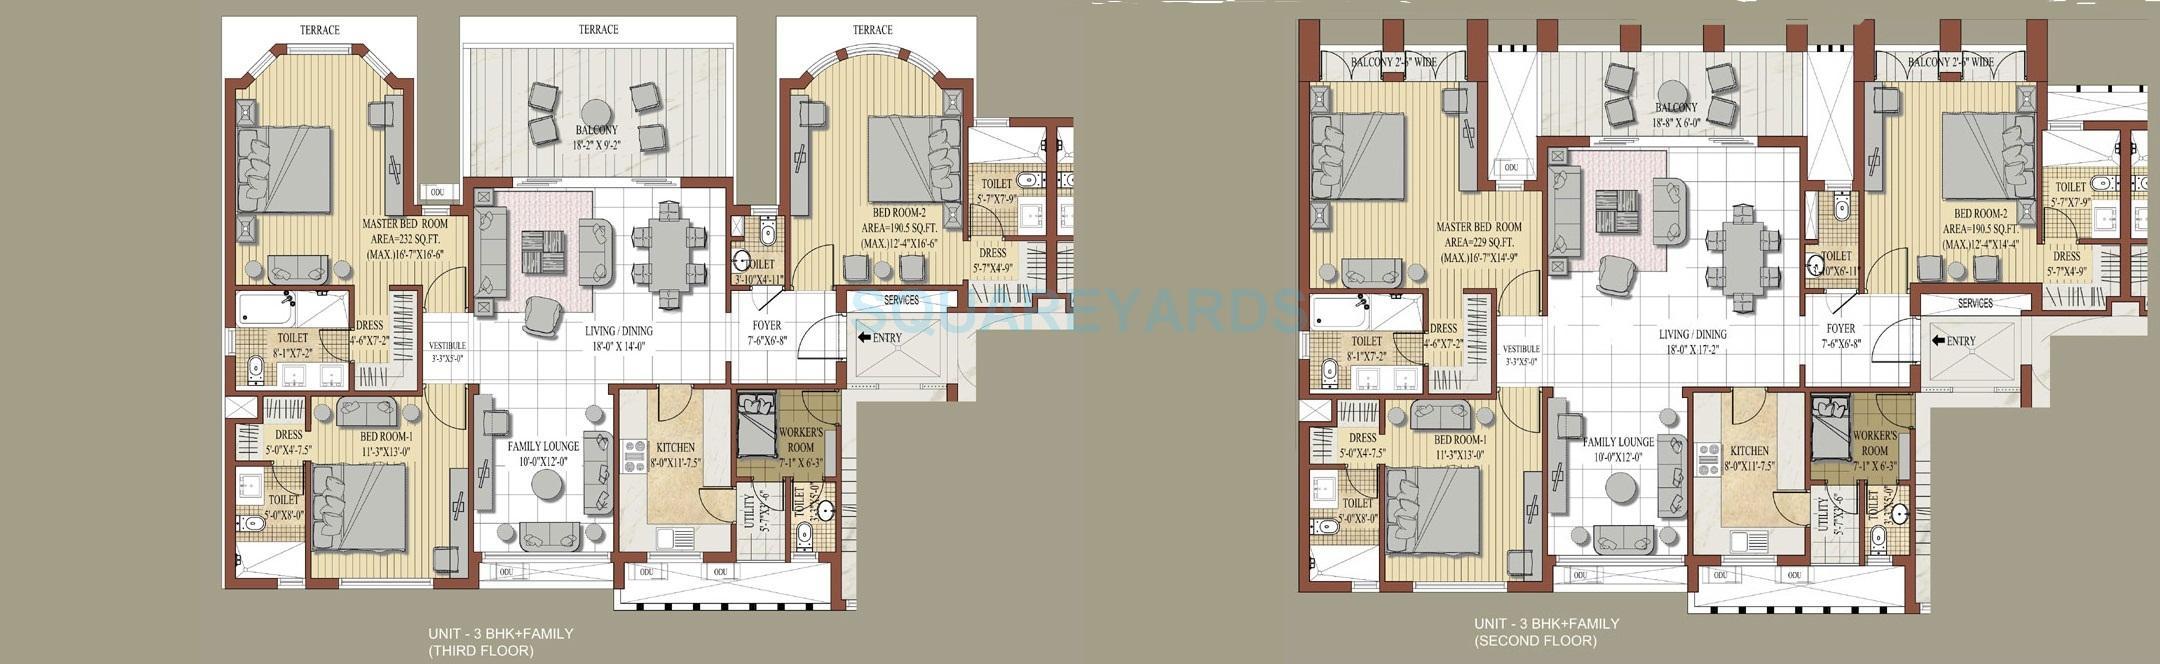 jaypee knight court apartment 3bhk 2300sqft 1